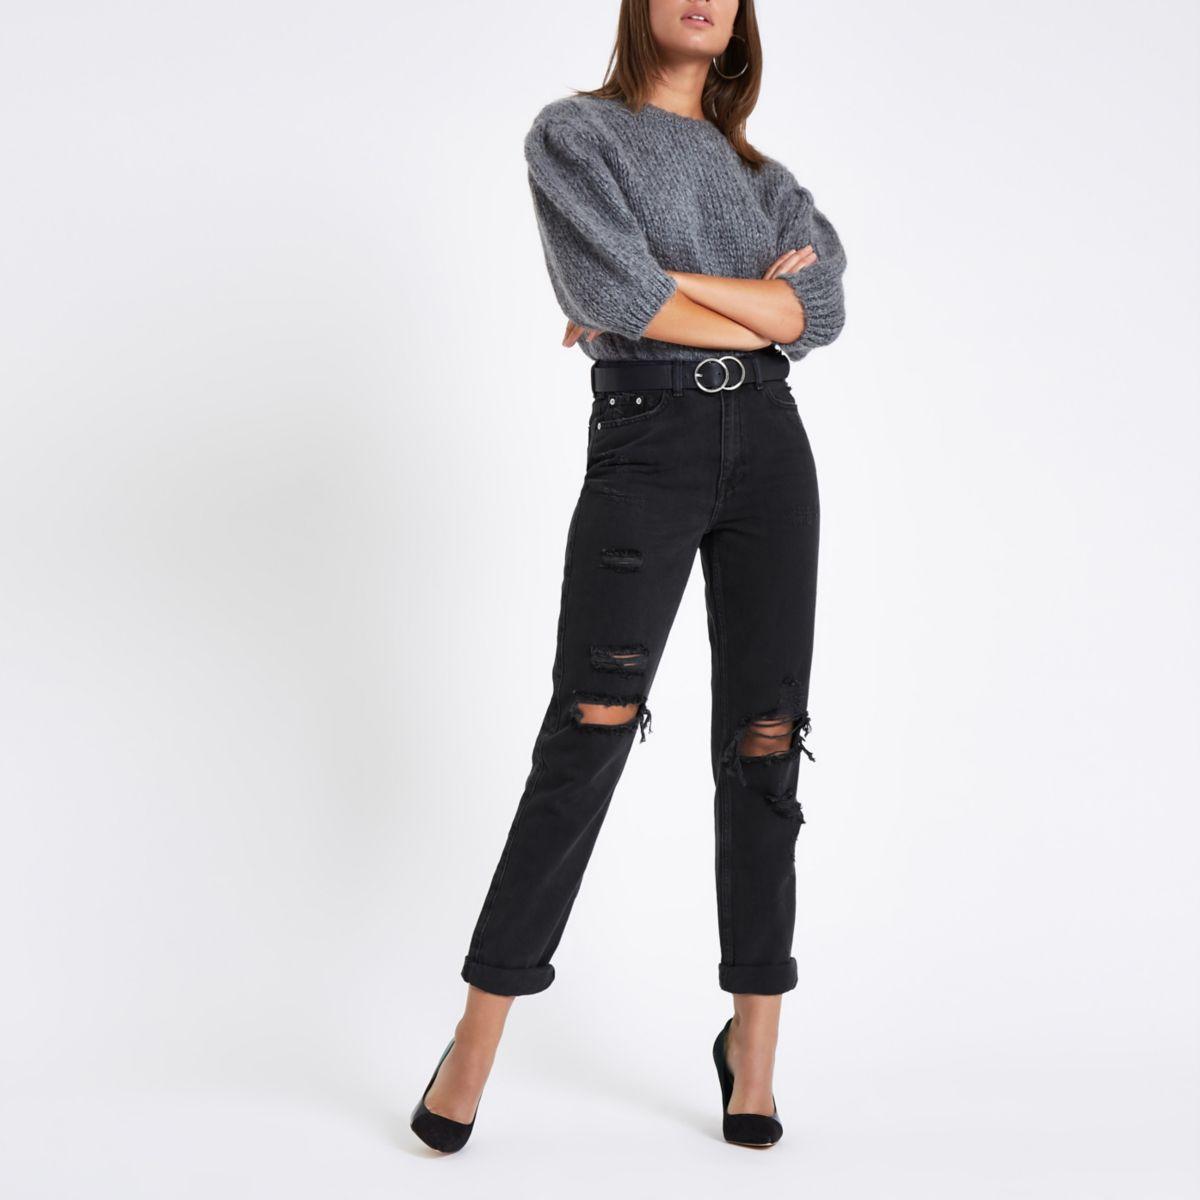 Zwarte ripped mom jeans met hoge taille